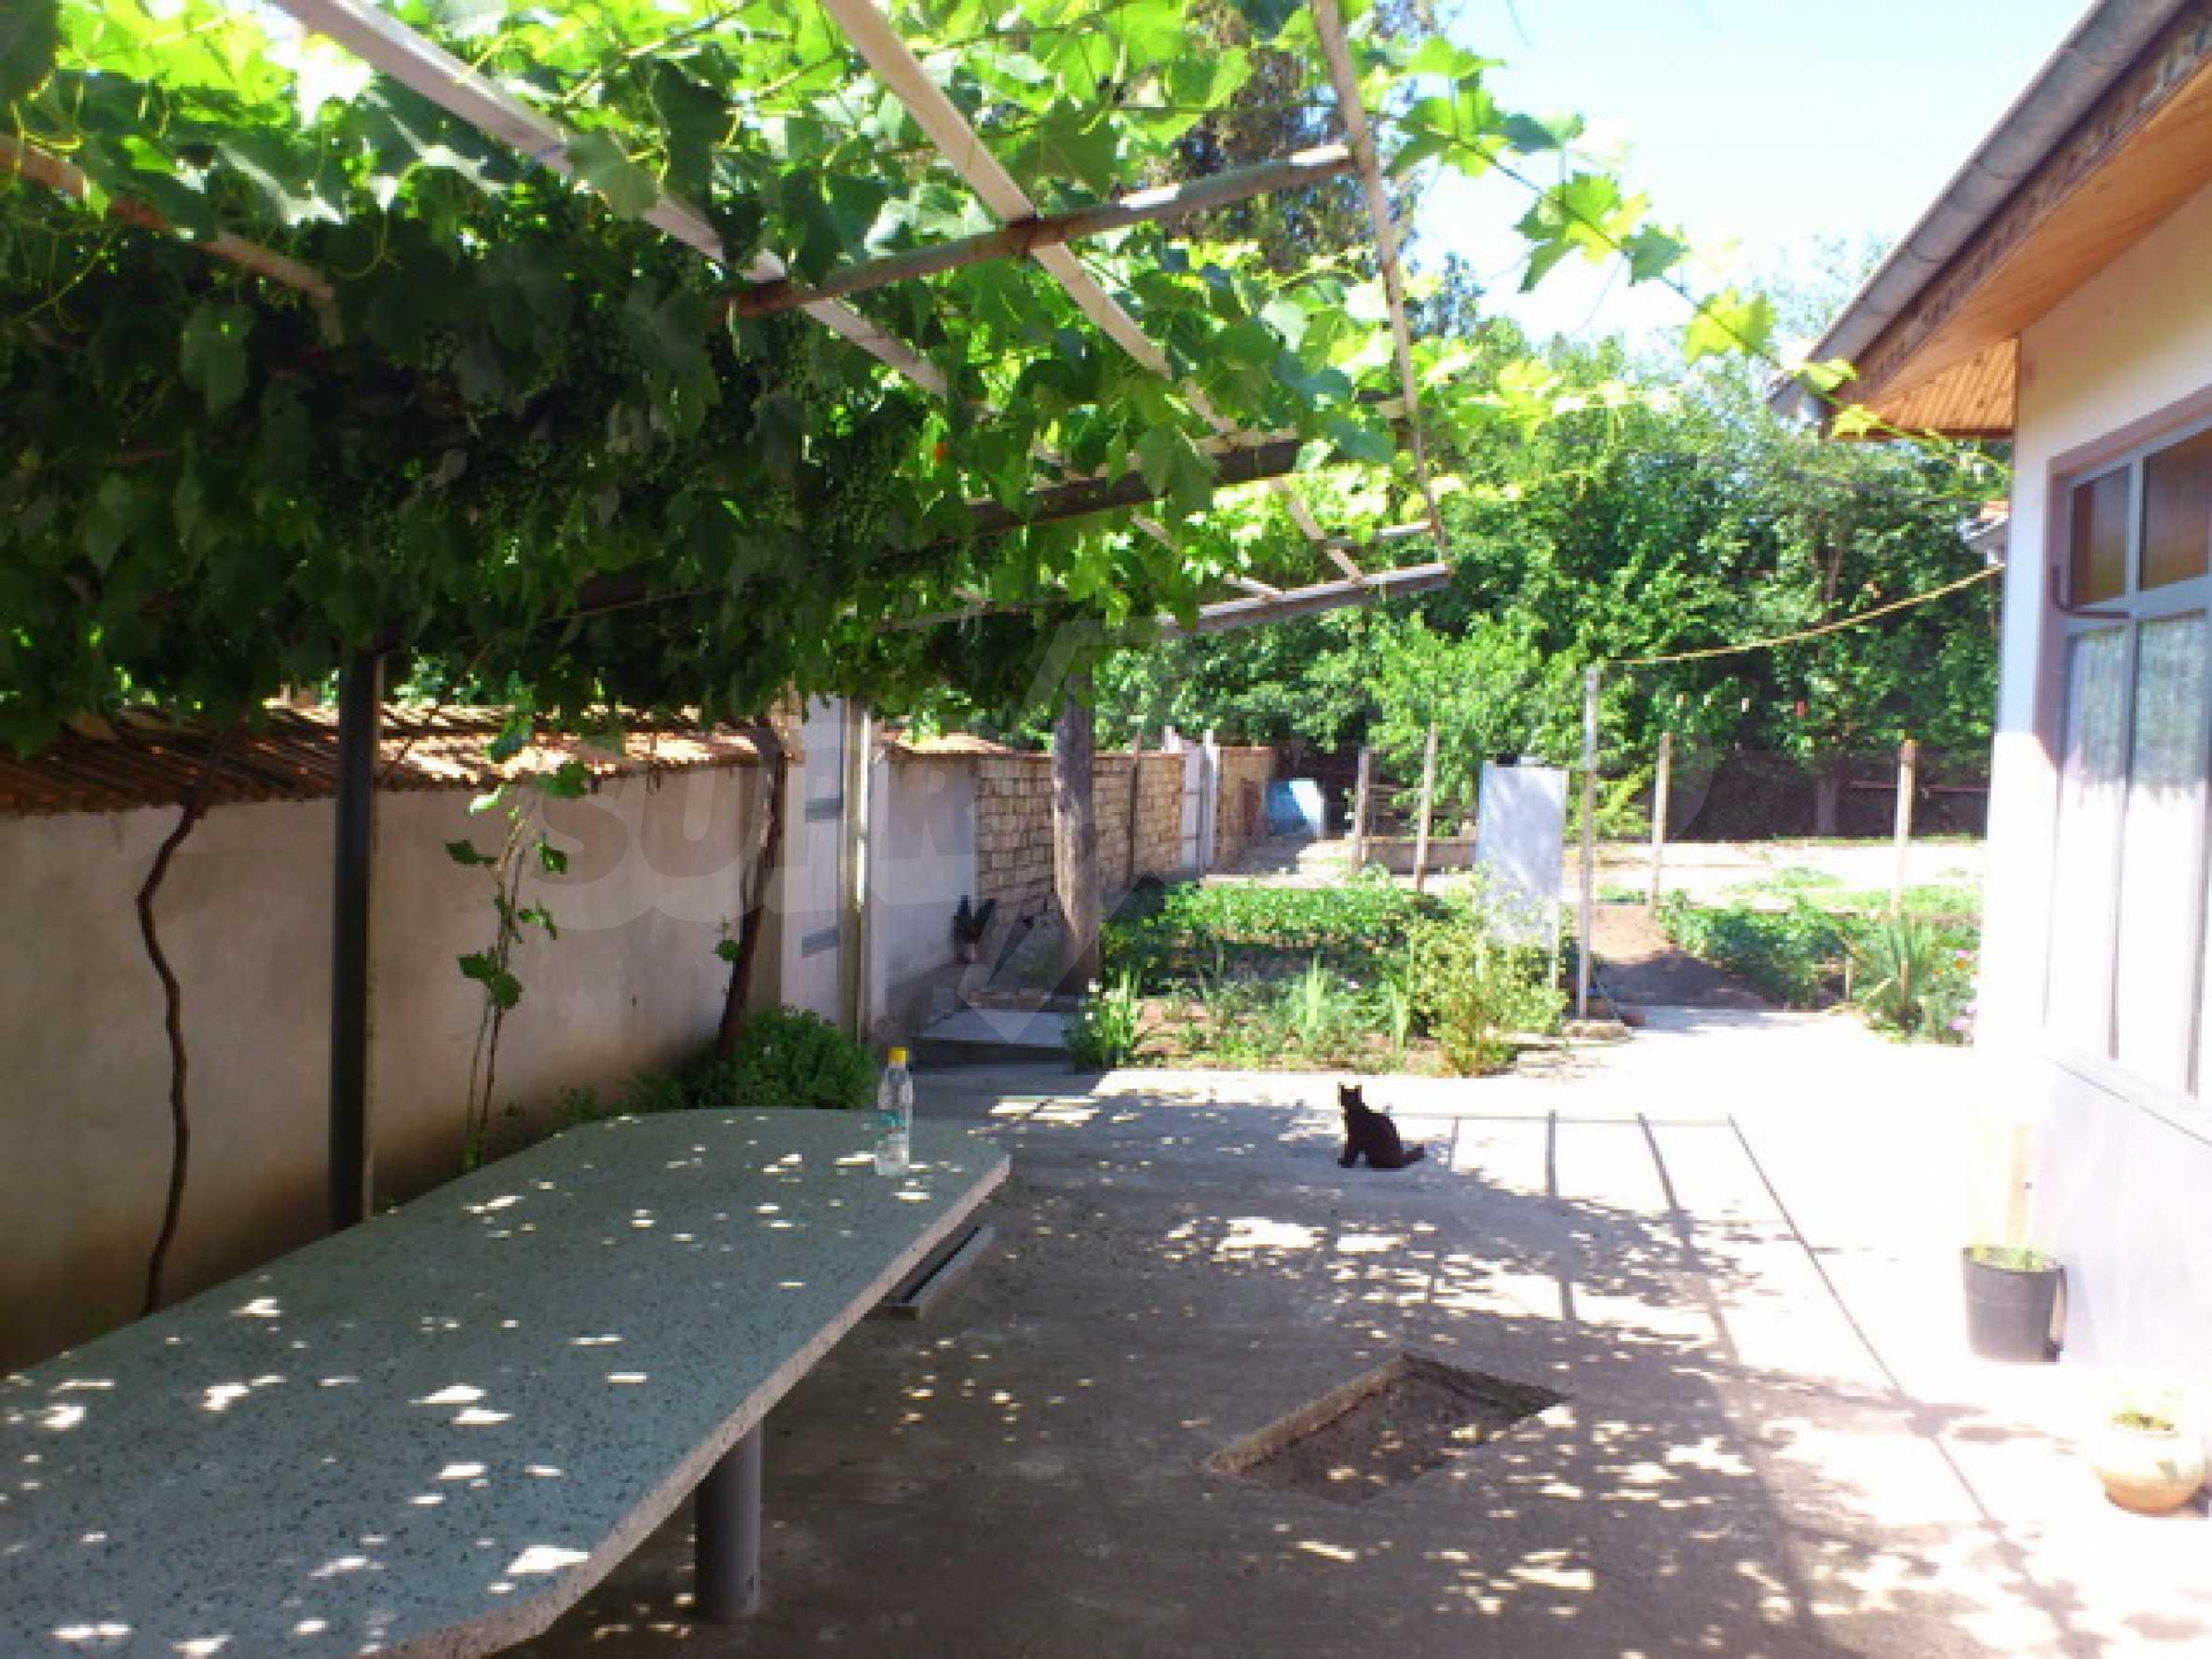 Renovated farmhouse in excellent condition in a village 45 km. from Veliko Tarnovo 28